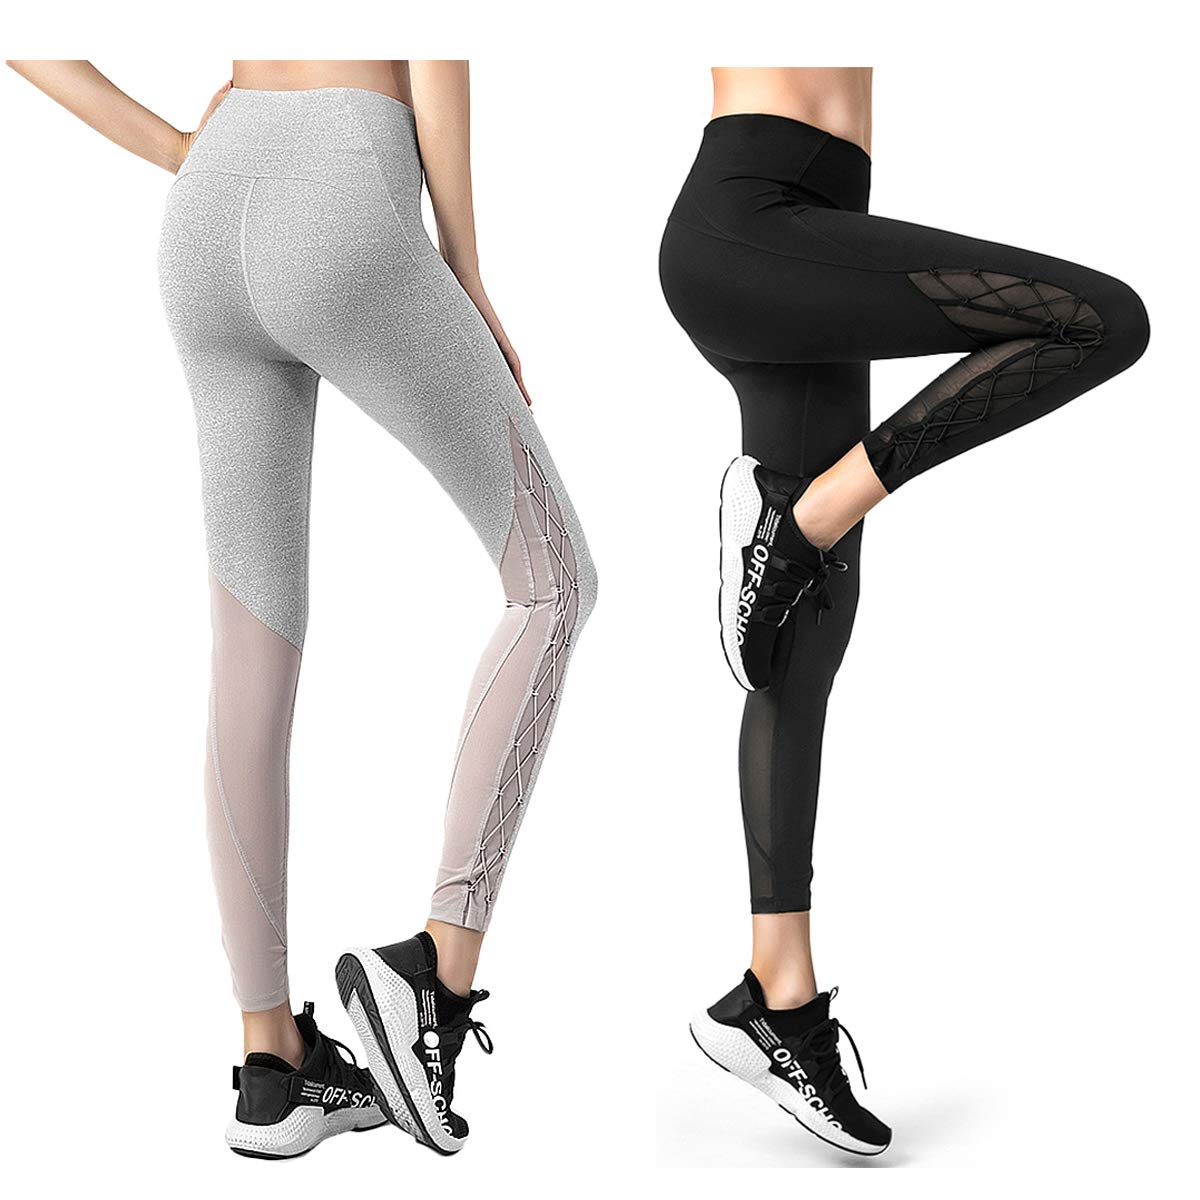 KSUA Womens Mesh Yoga Pants High Waist Workout Running Leggings Capris Gym Tights Sport Leggings